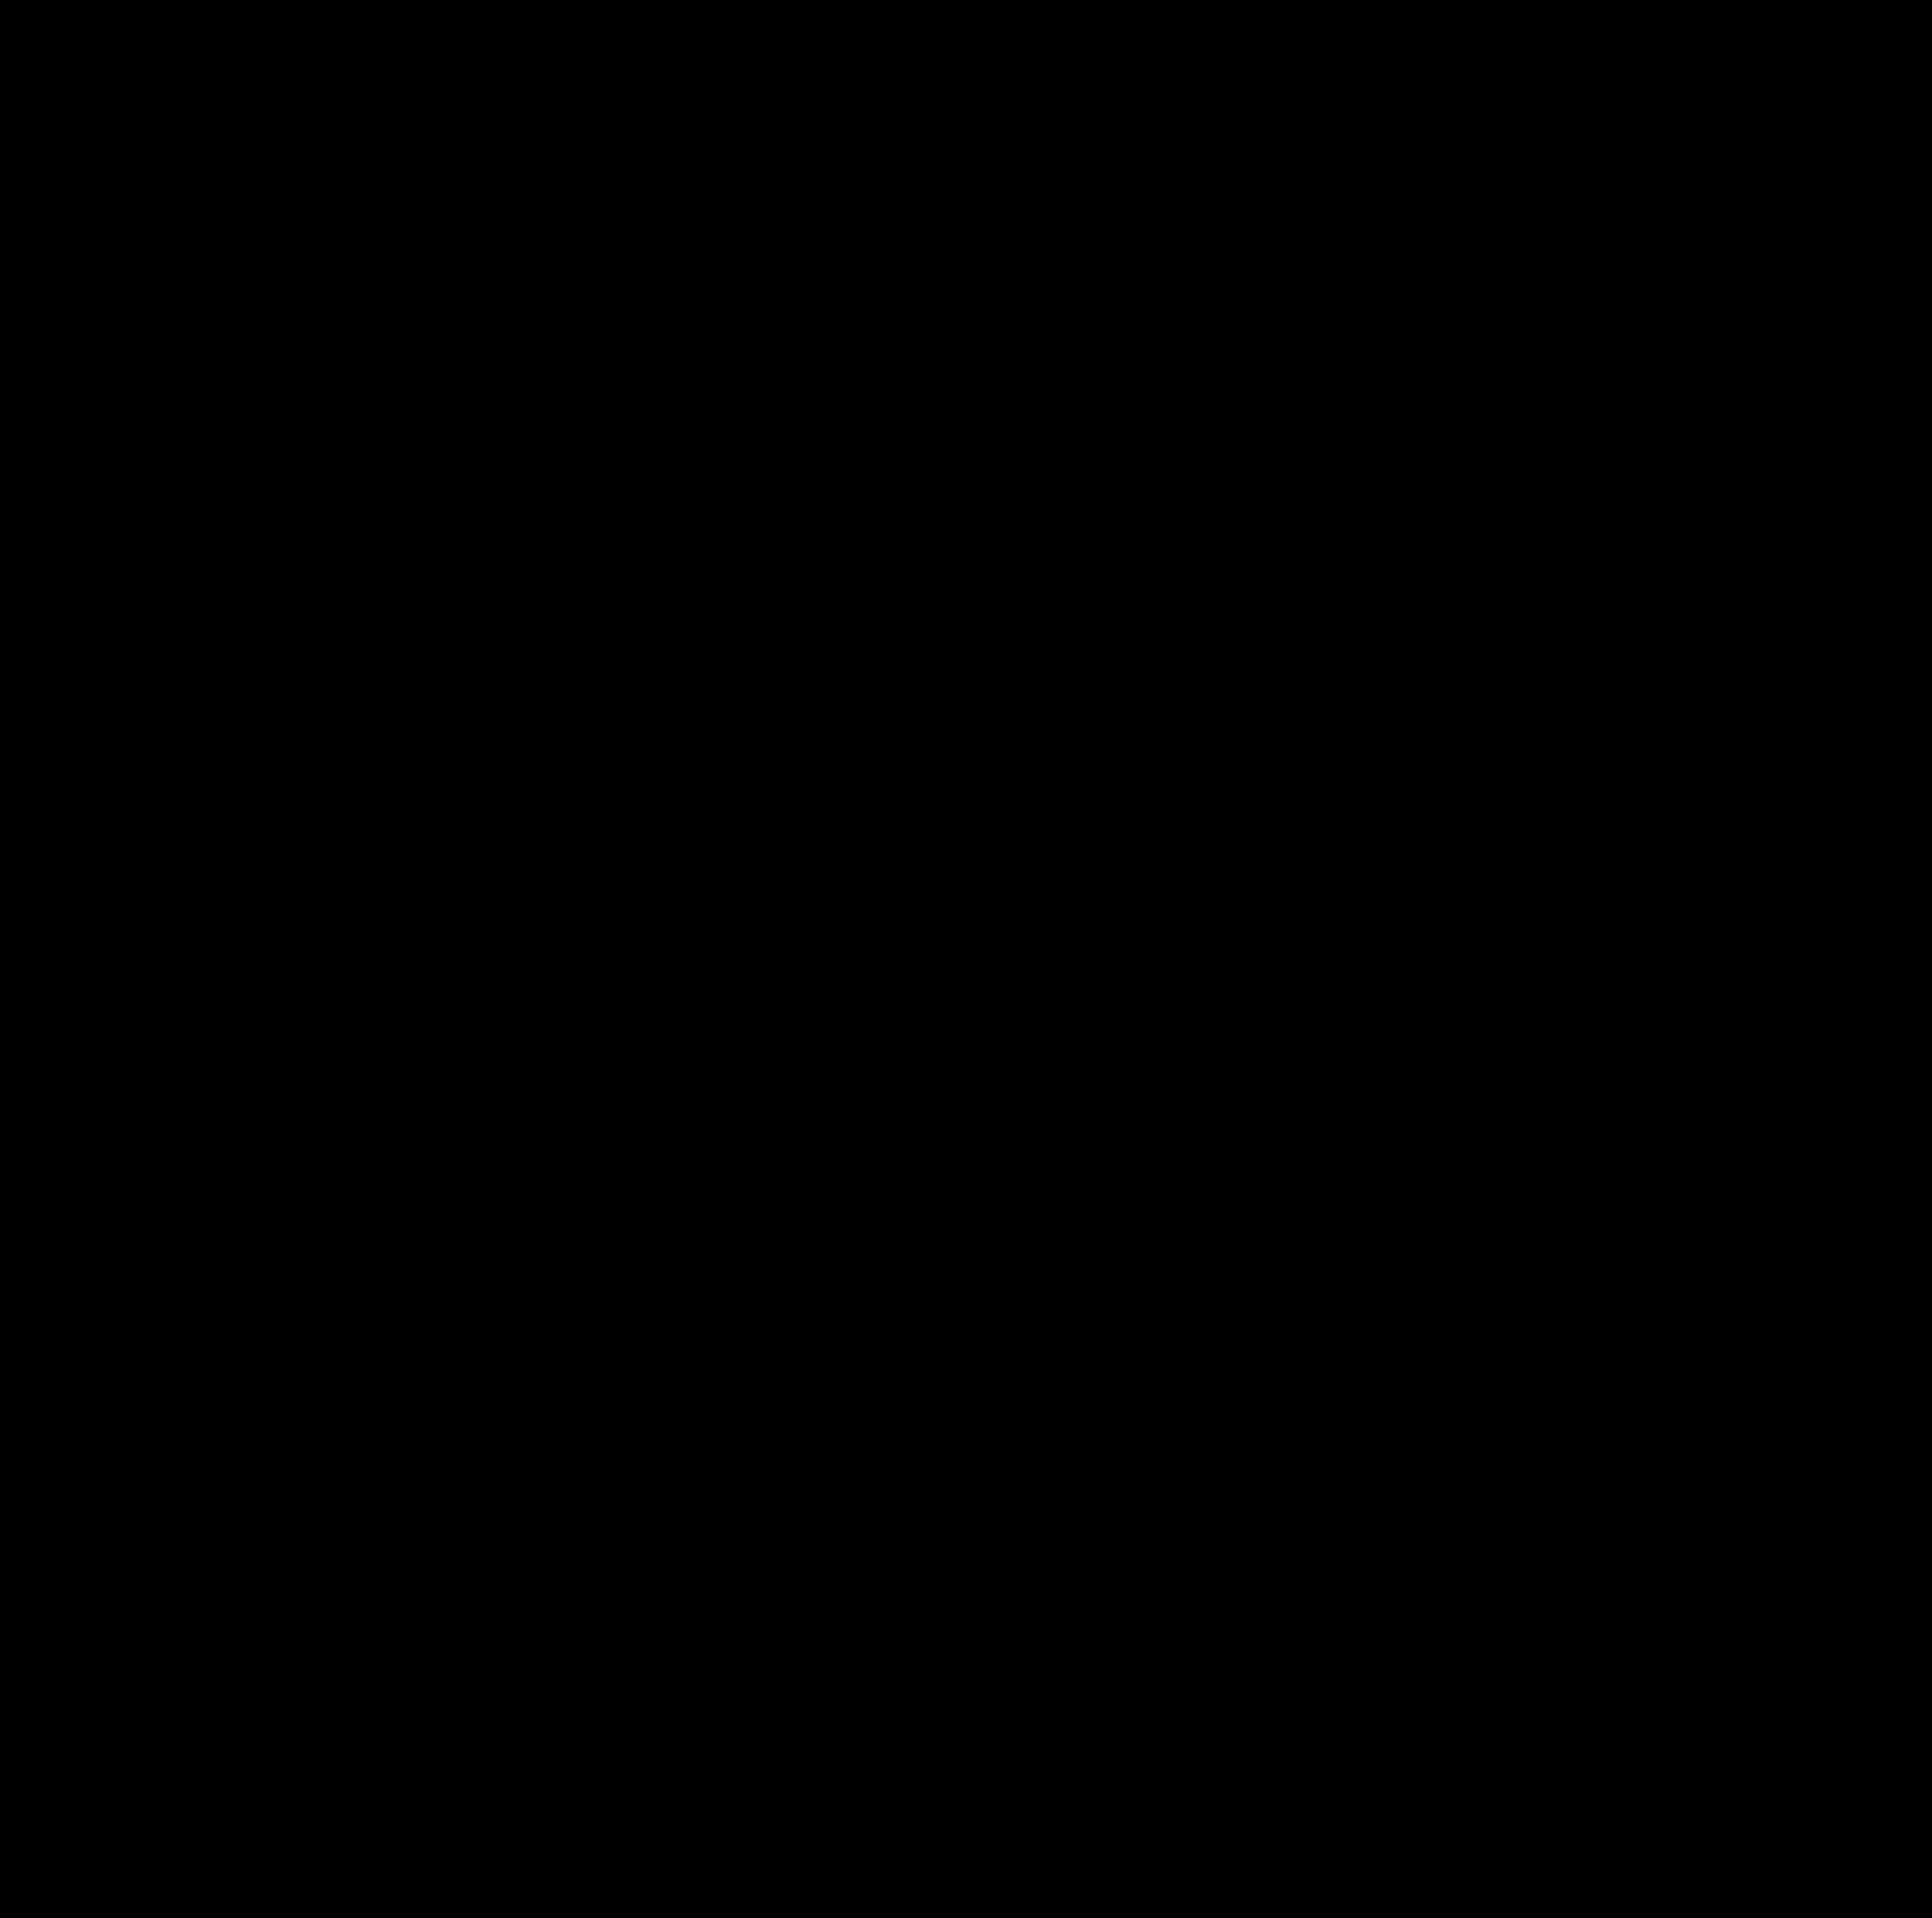 skunk silhouette by dear_theophilus, a skunk silhouette